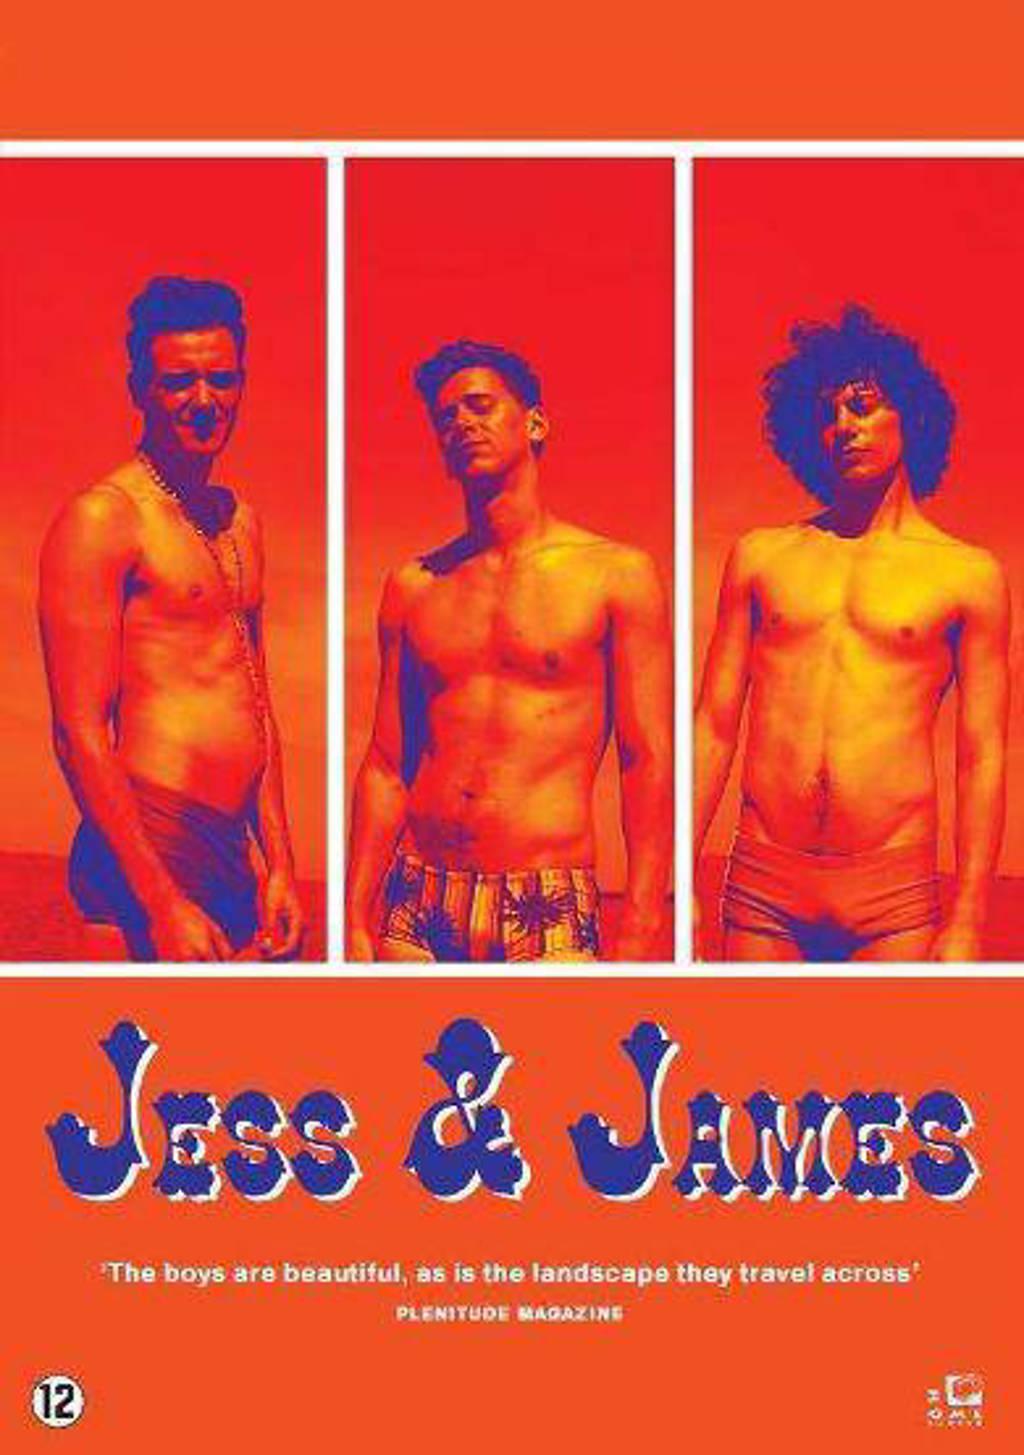 Jess & James (DVD)